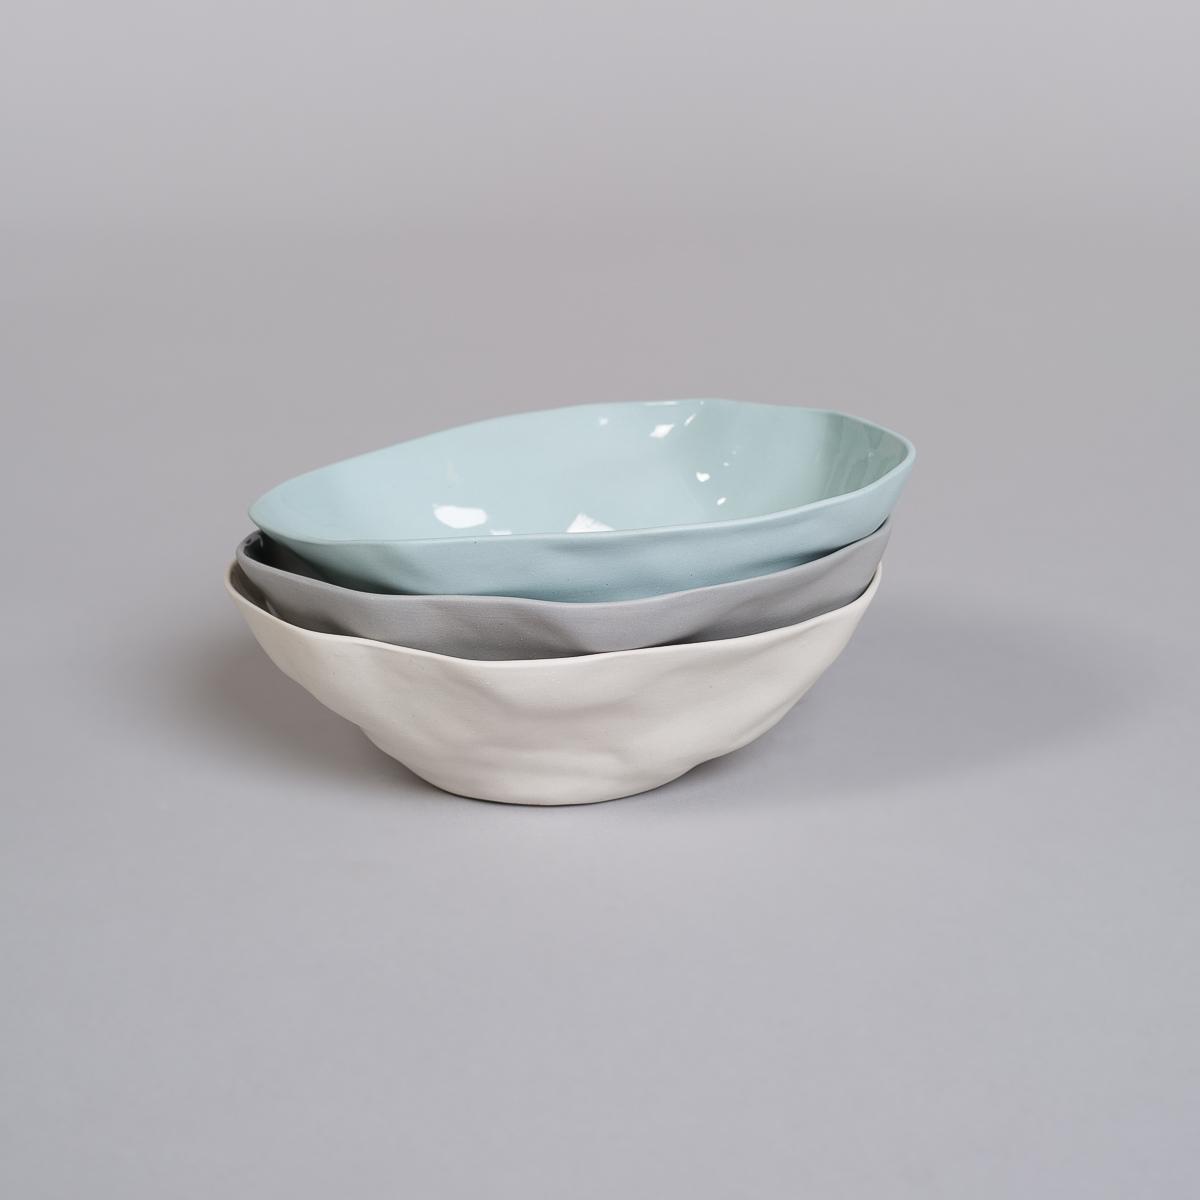 Bolle Medium i Porselen - Krem-252